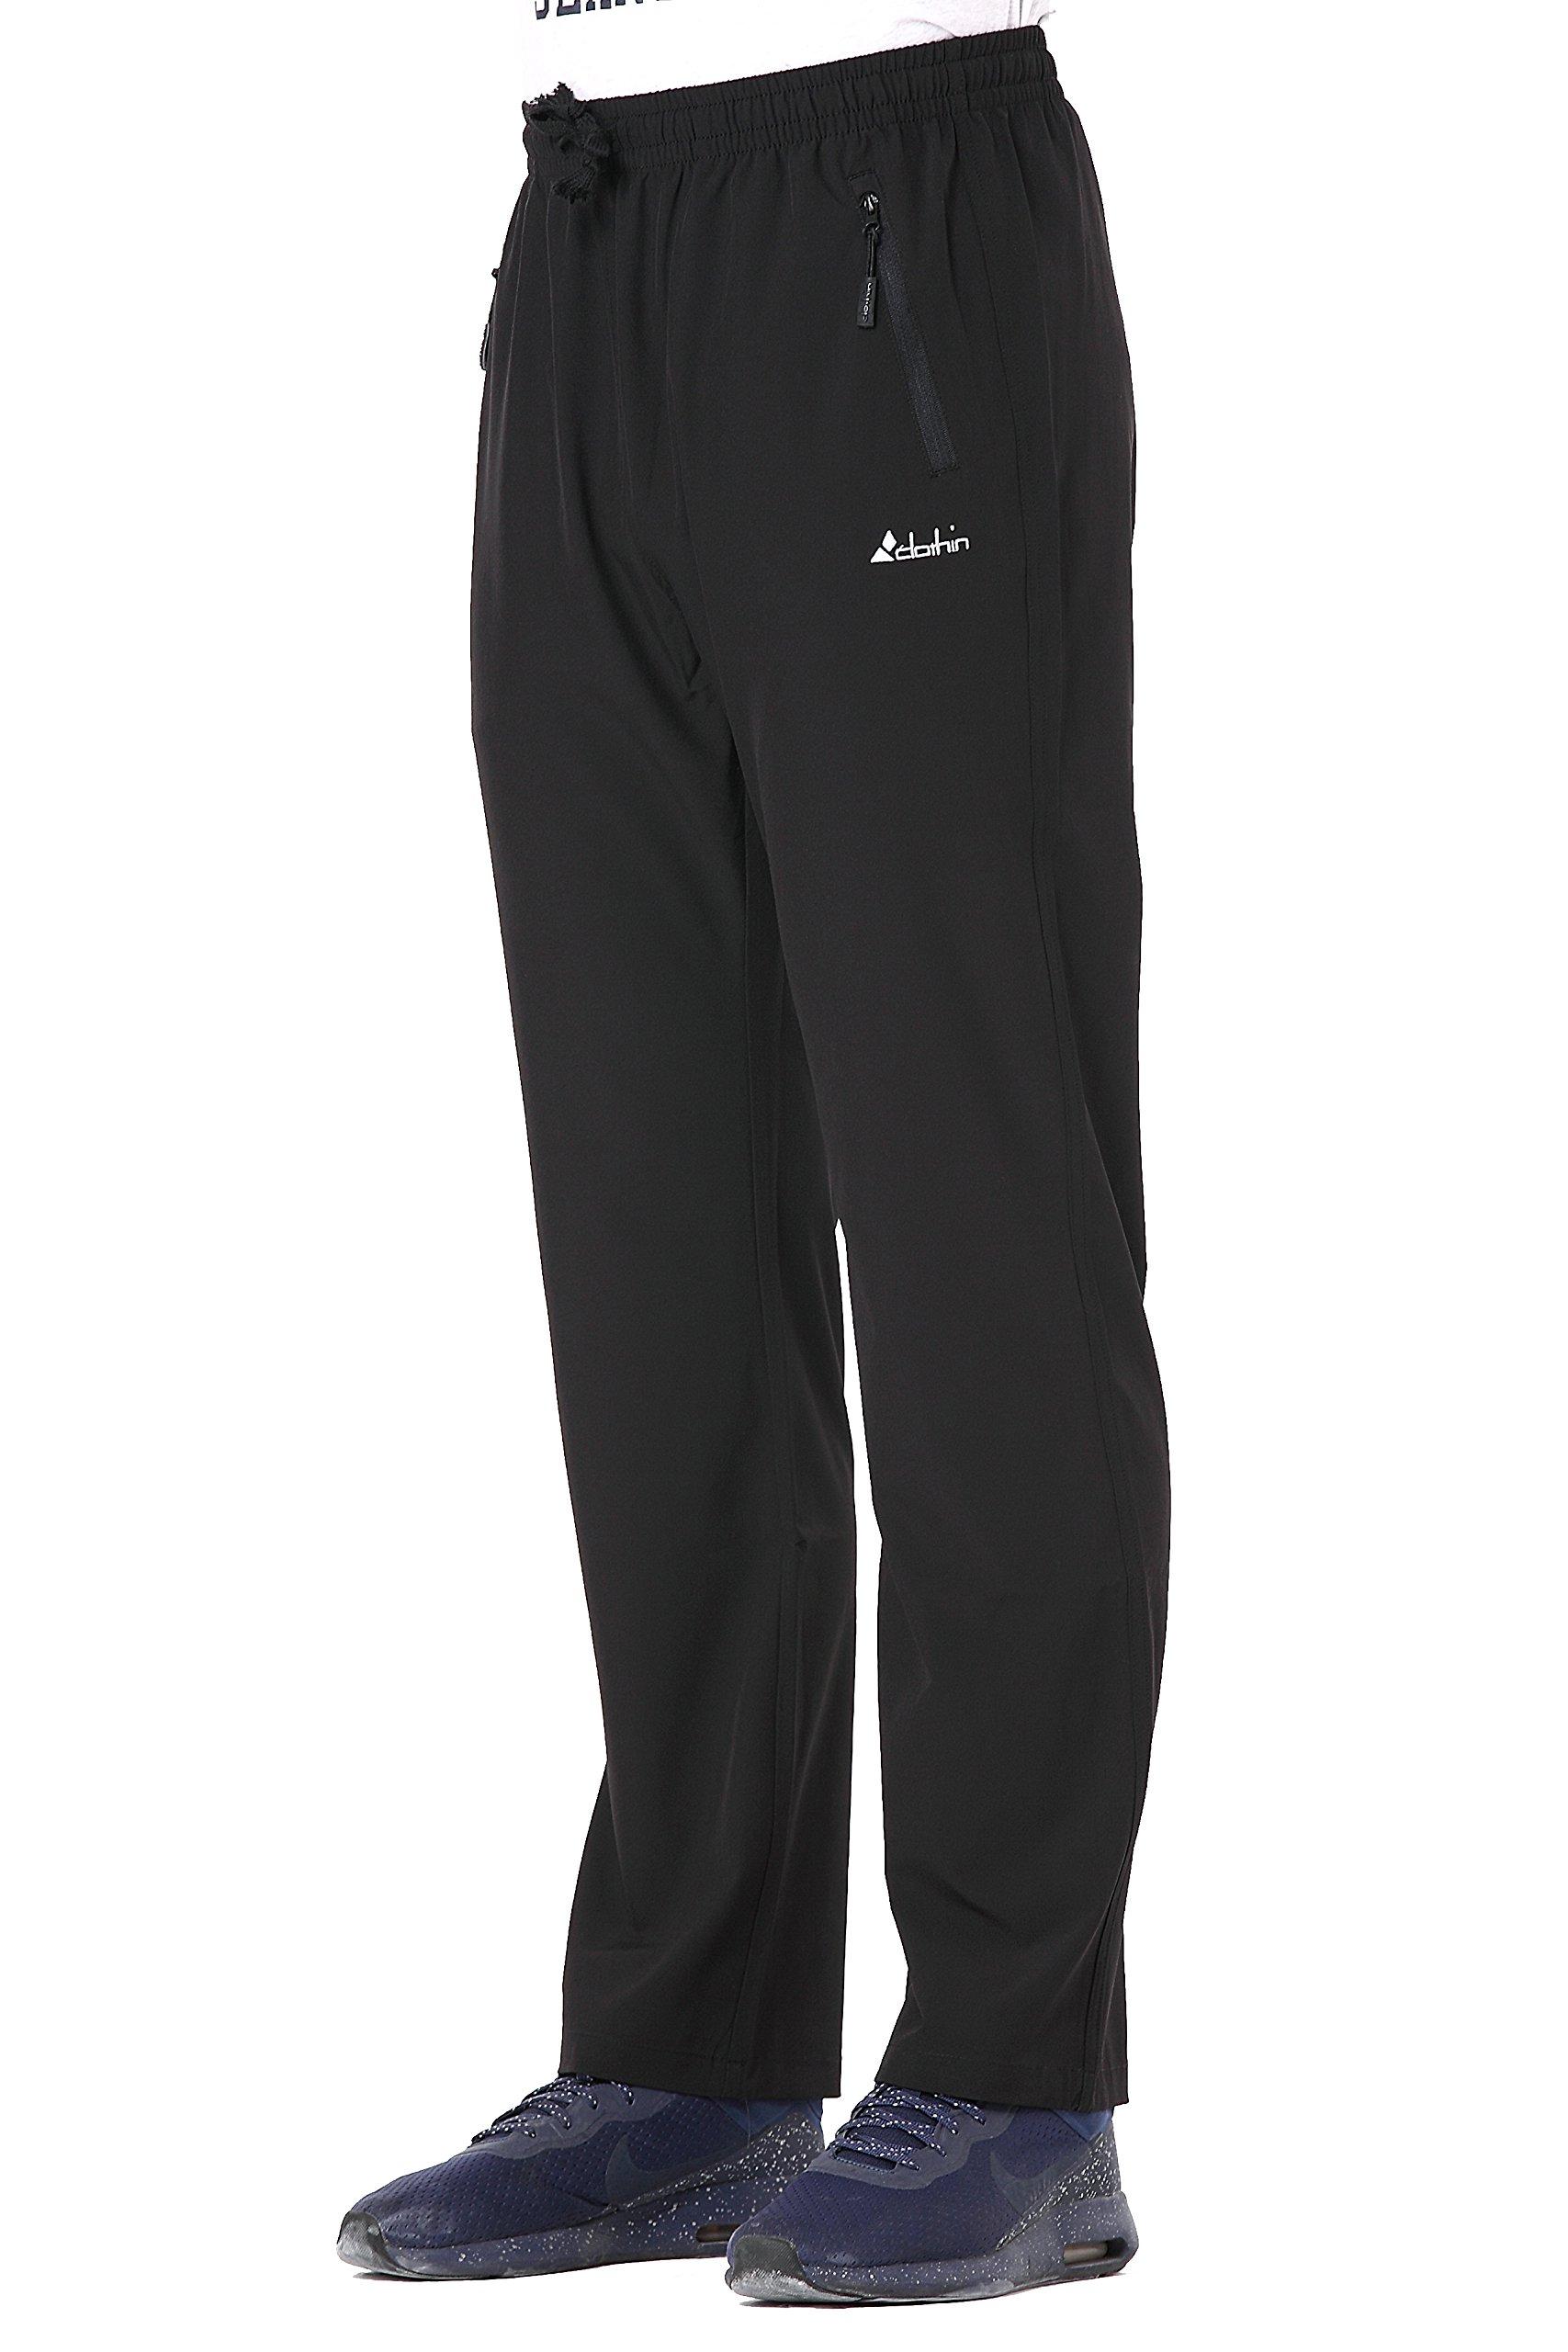 Clothin Men's Stretch Elastic-Waist Drawstring Pants With Front Zipper Pockets,Black,XL (37-40W31.5L/Regular)